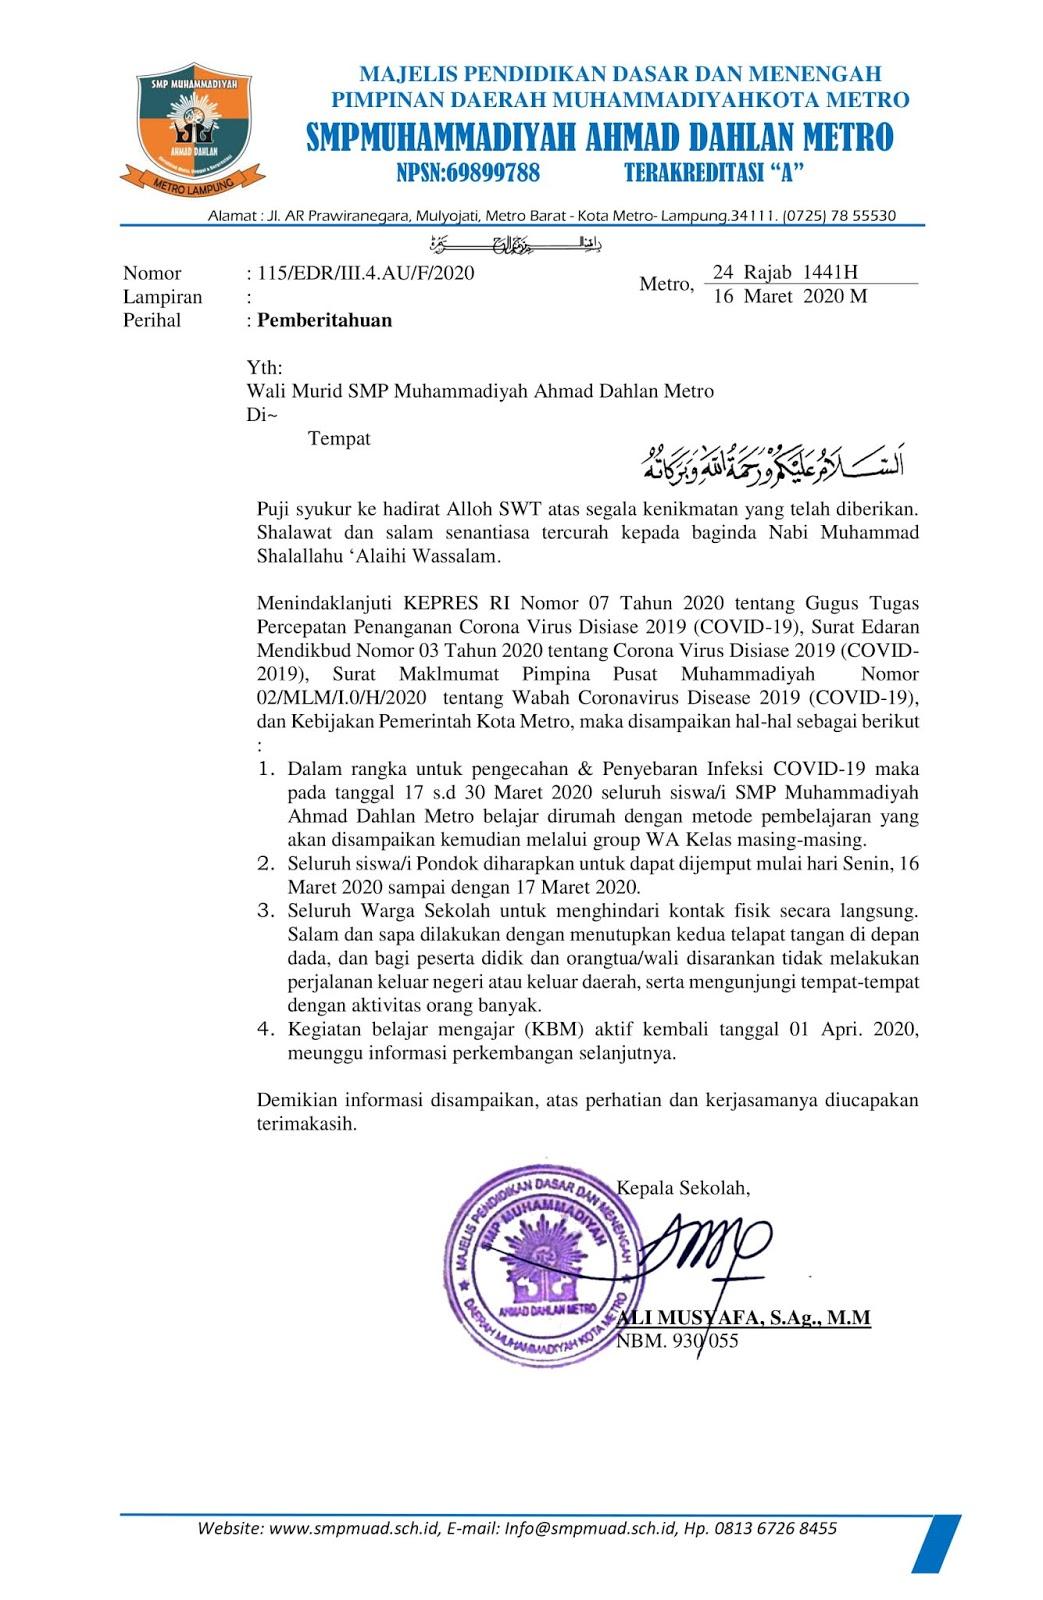 Surat Keputusan Pelayanan Sekolah